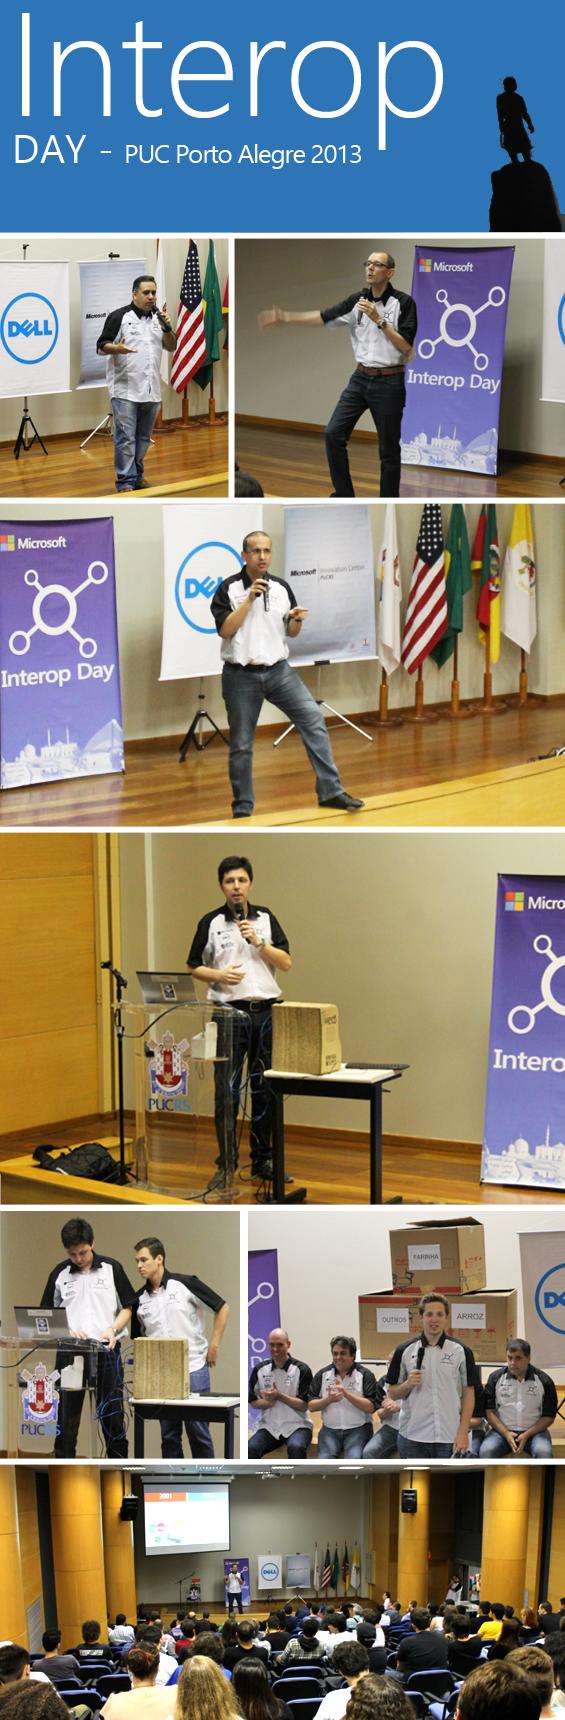 Interopday 2013